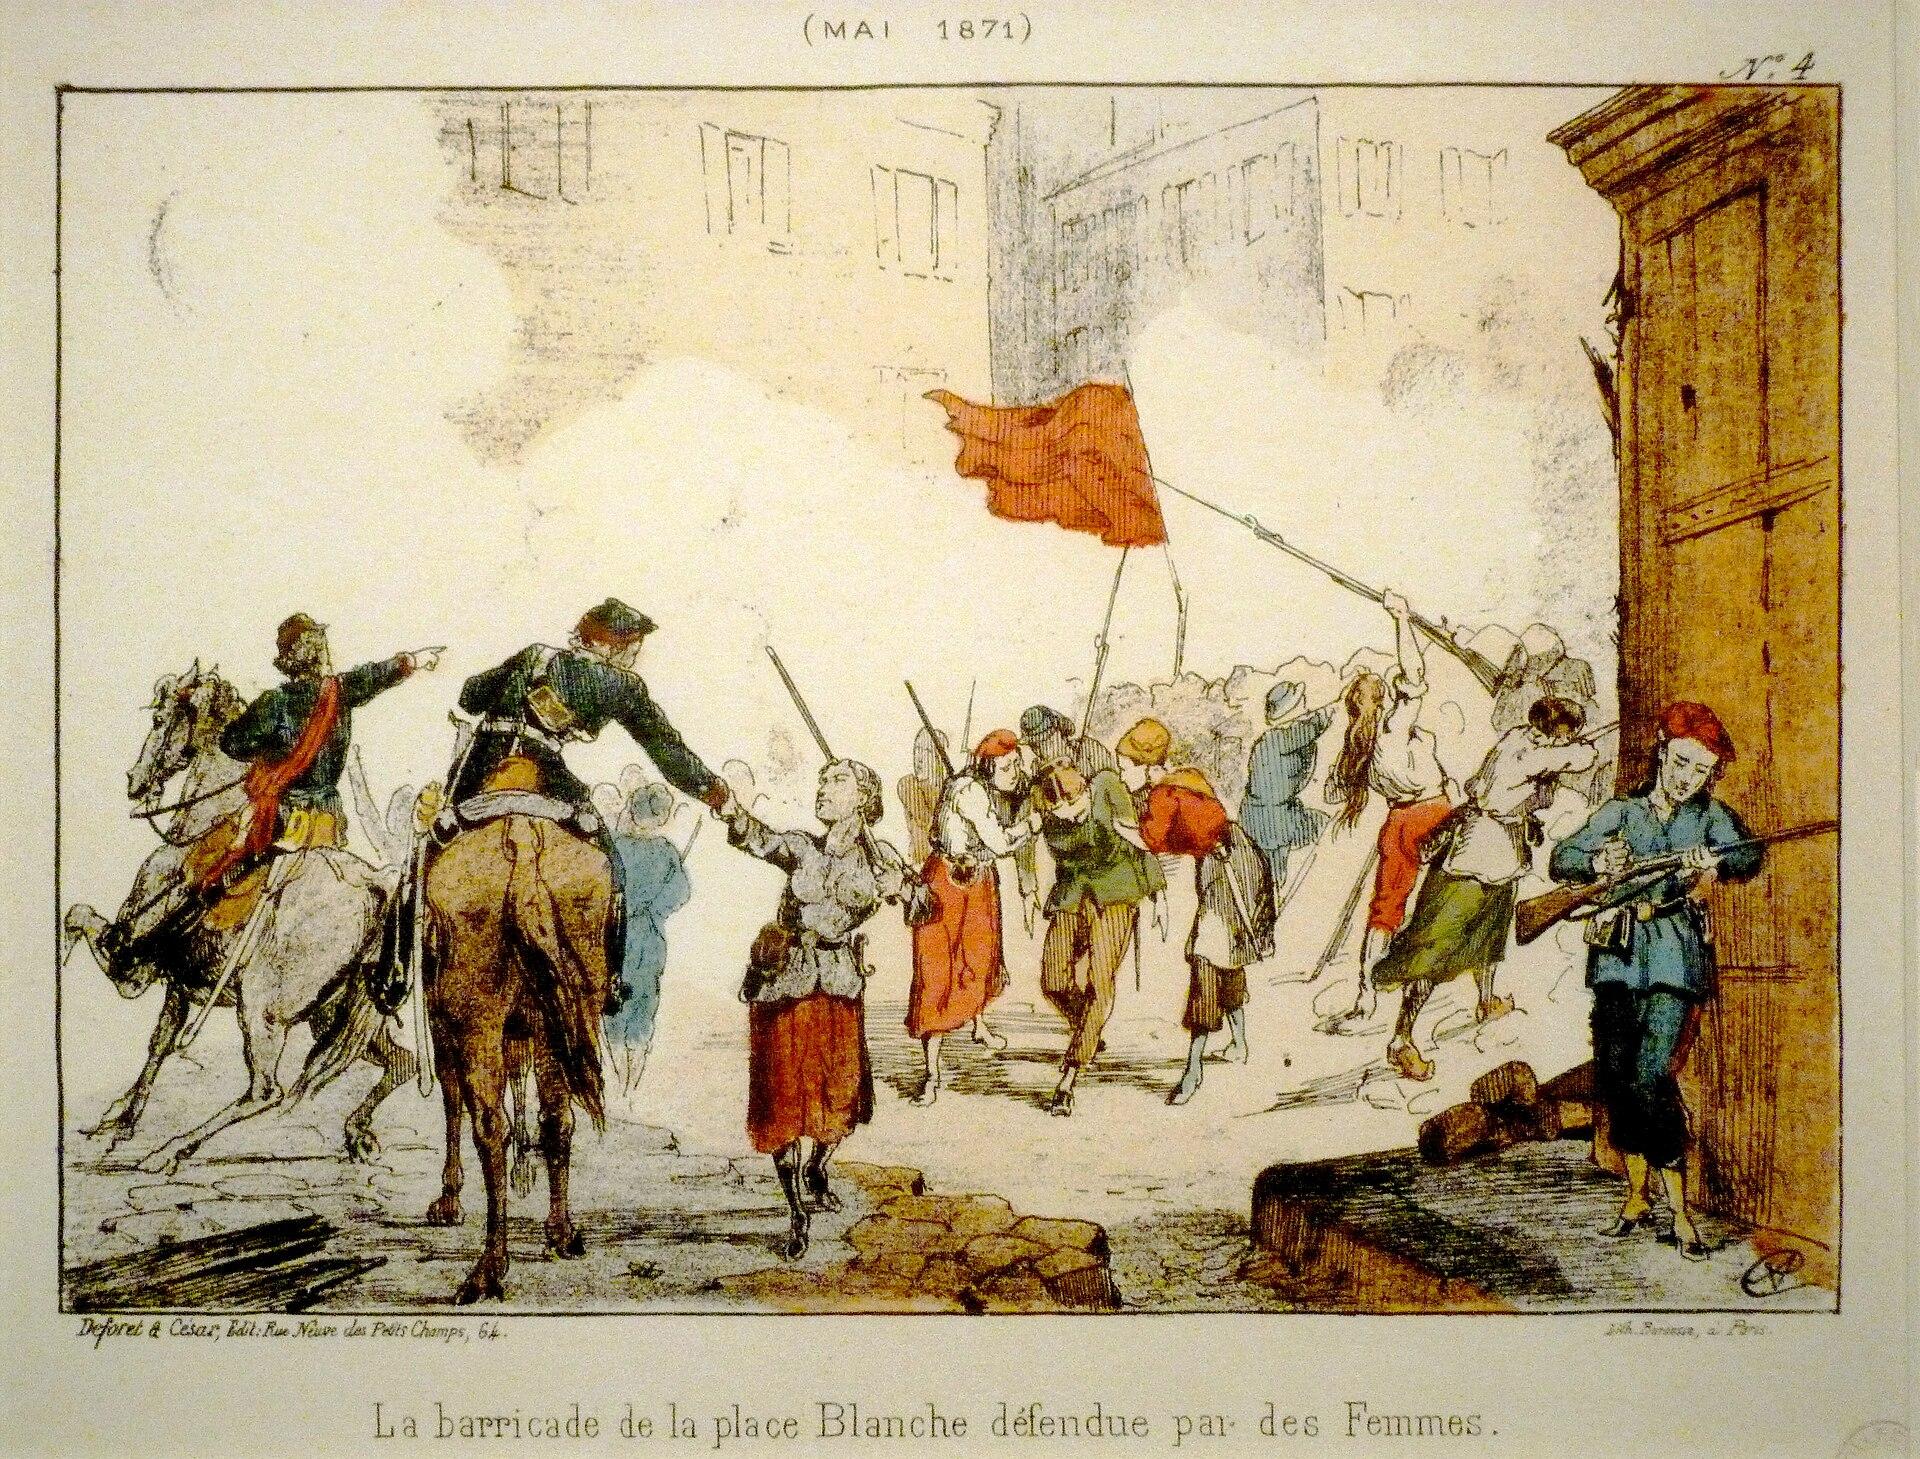 A brigade of women defending a barricade in the Paris Commune of 1871